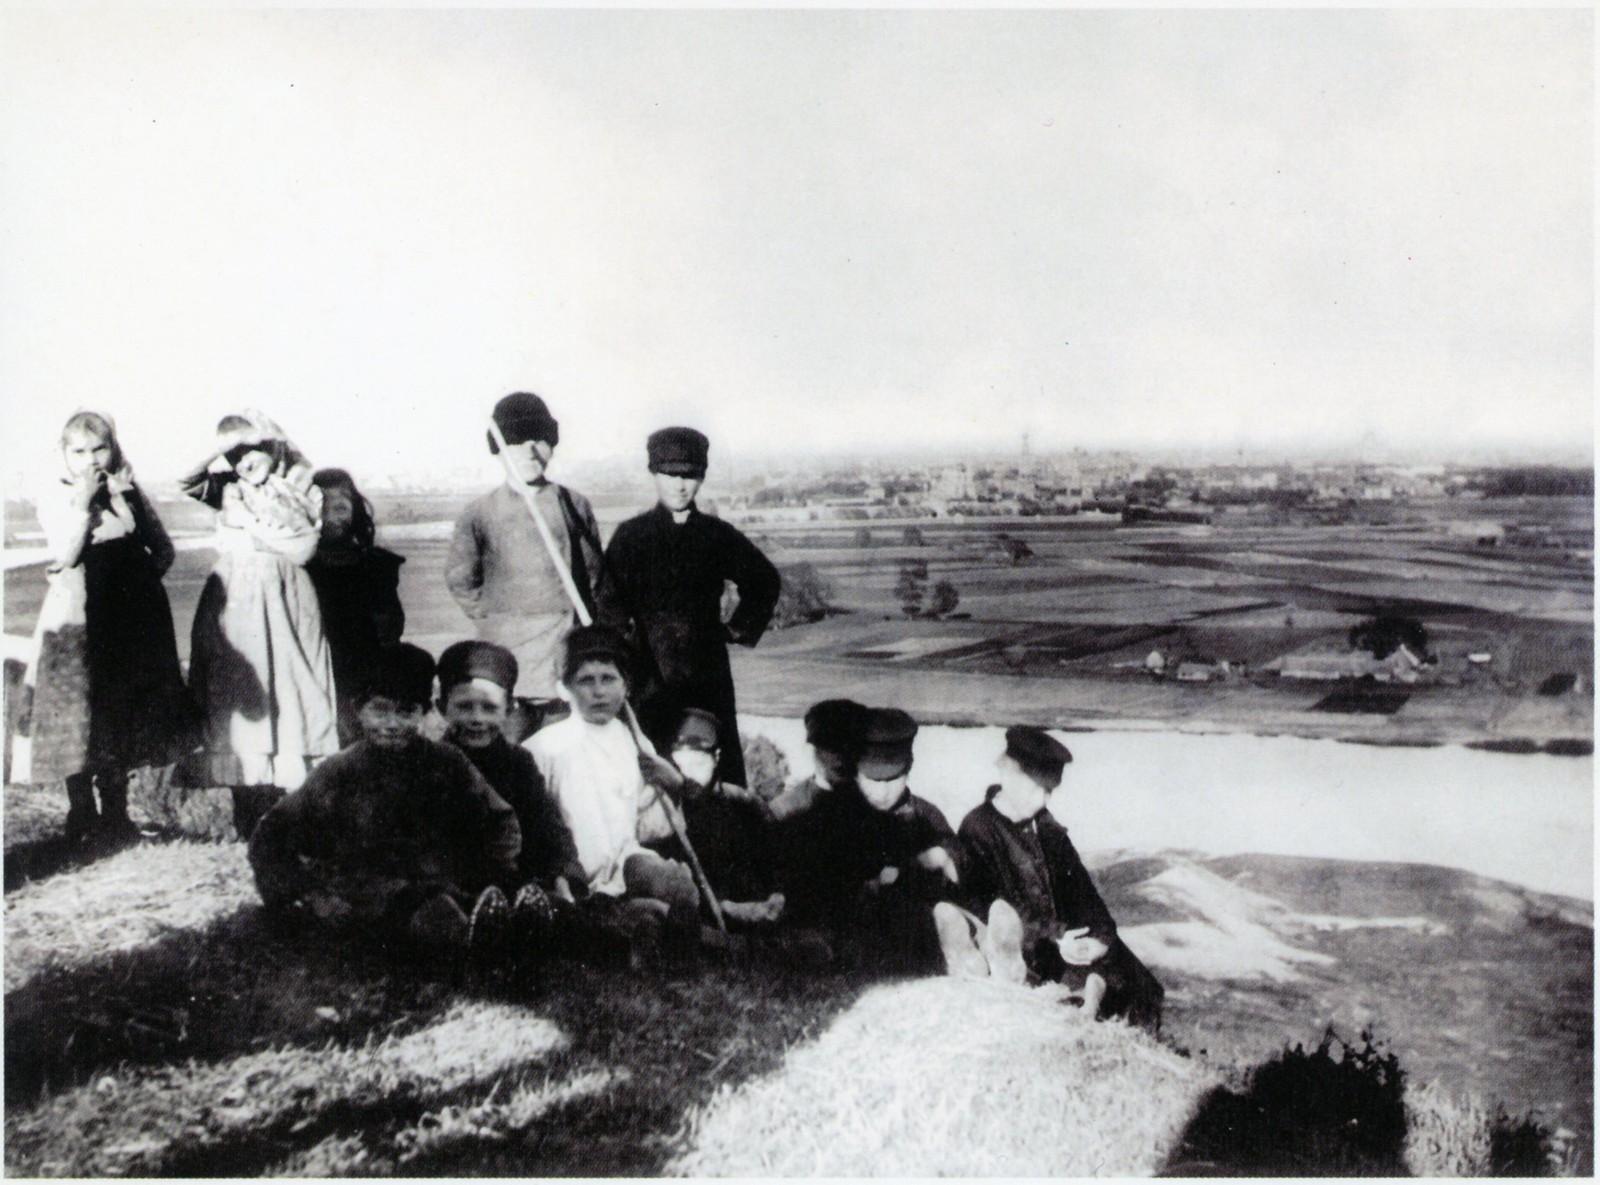 Дети села Воробьёво у Москва-реки, 1906 г.